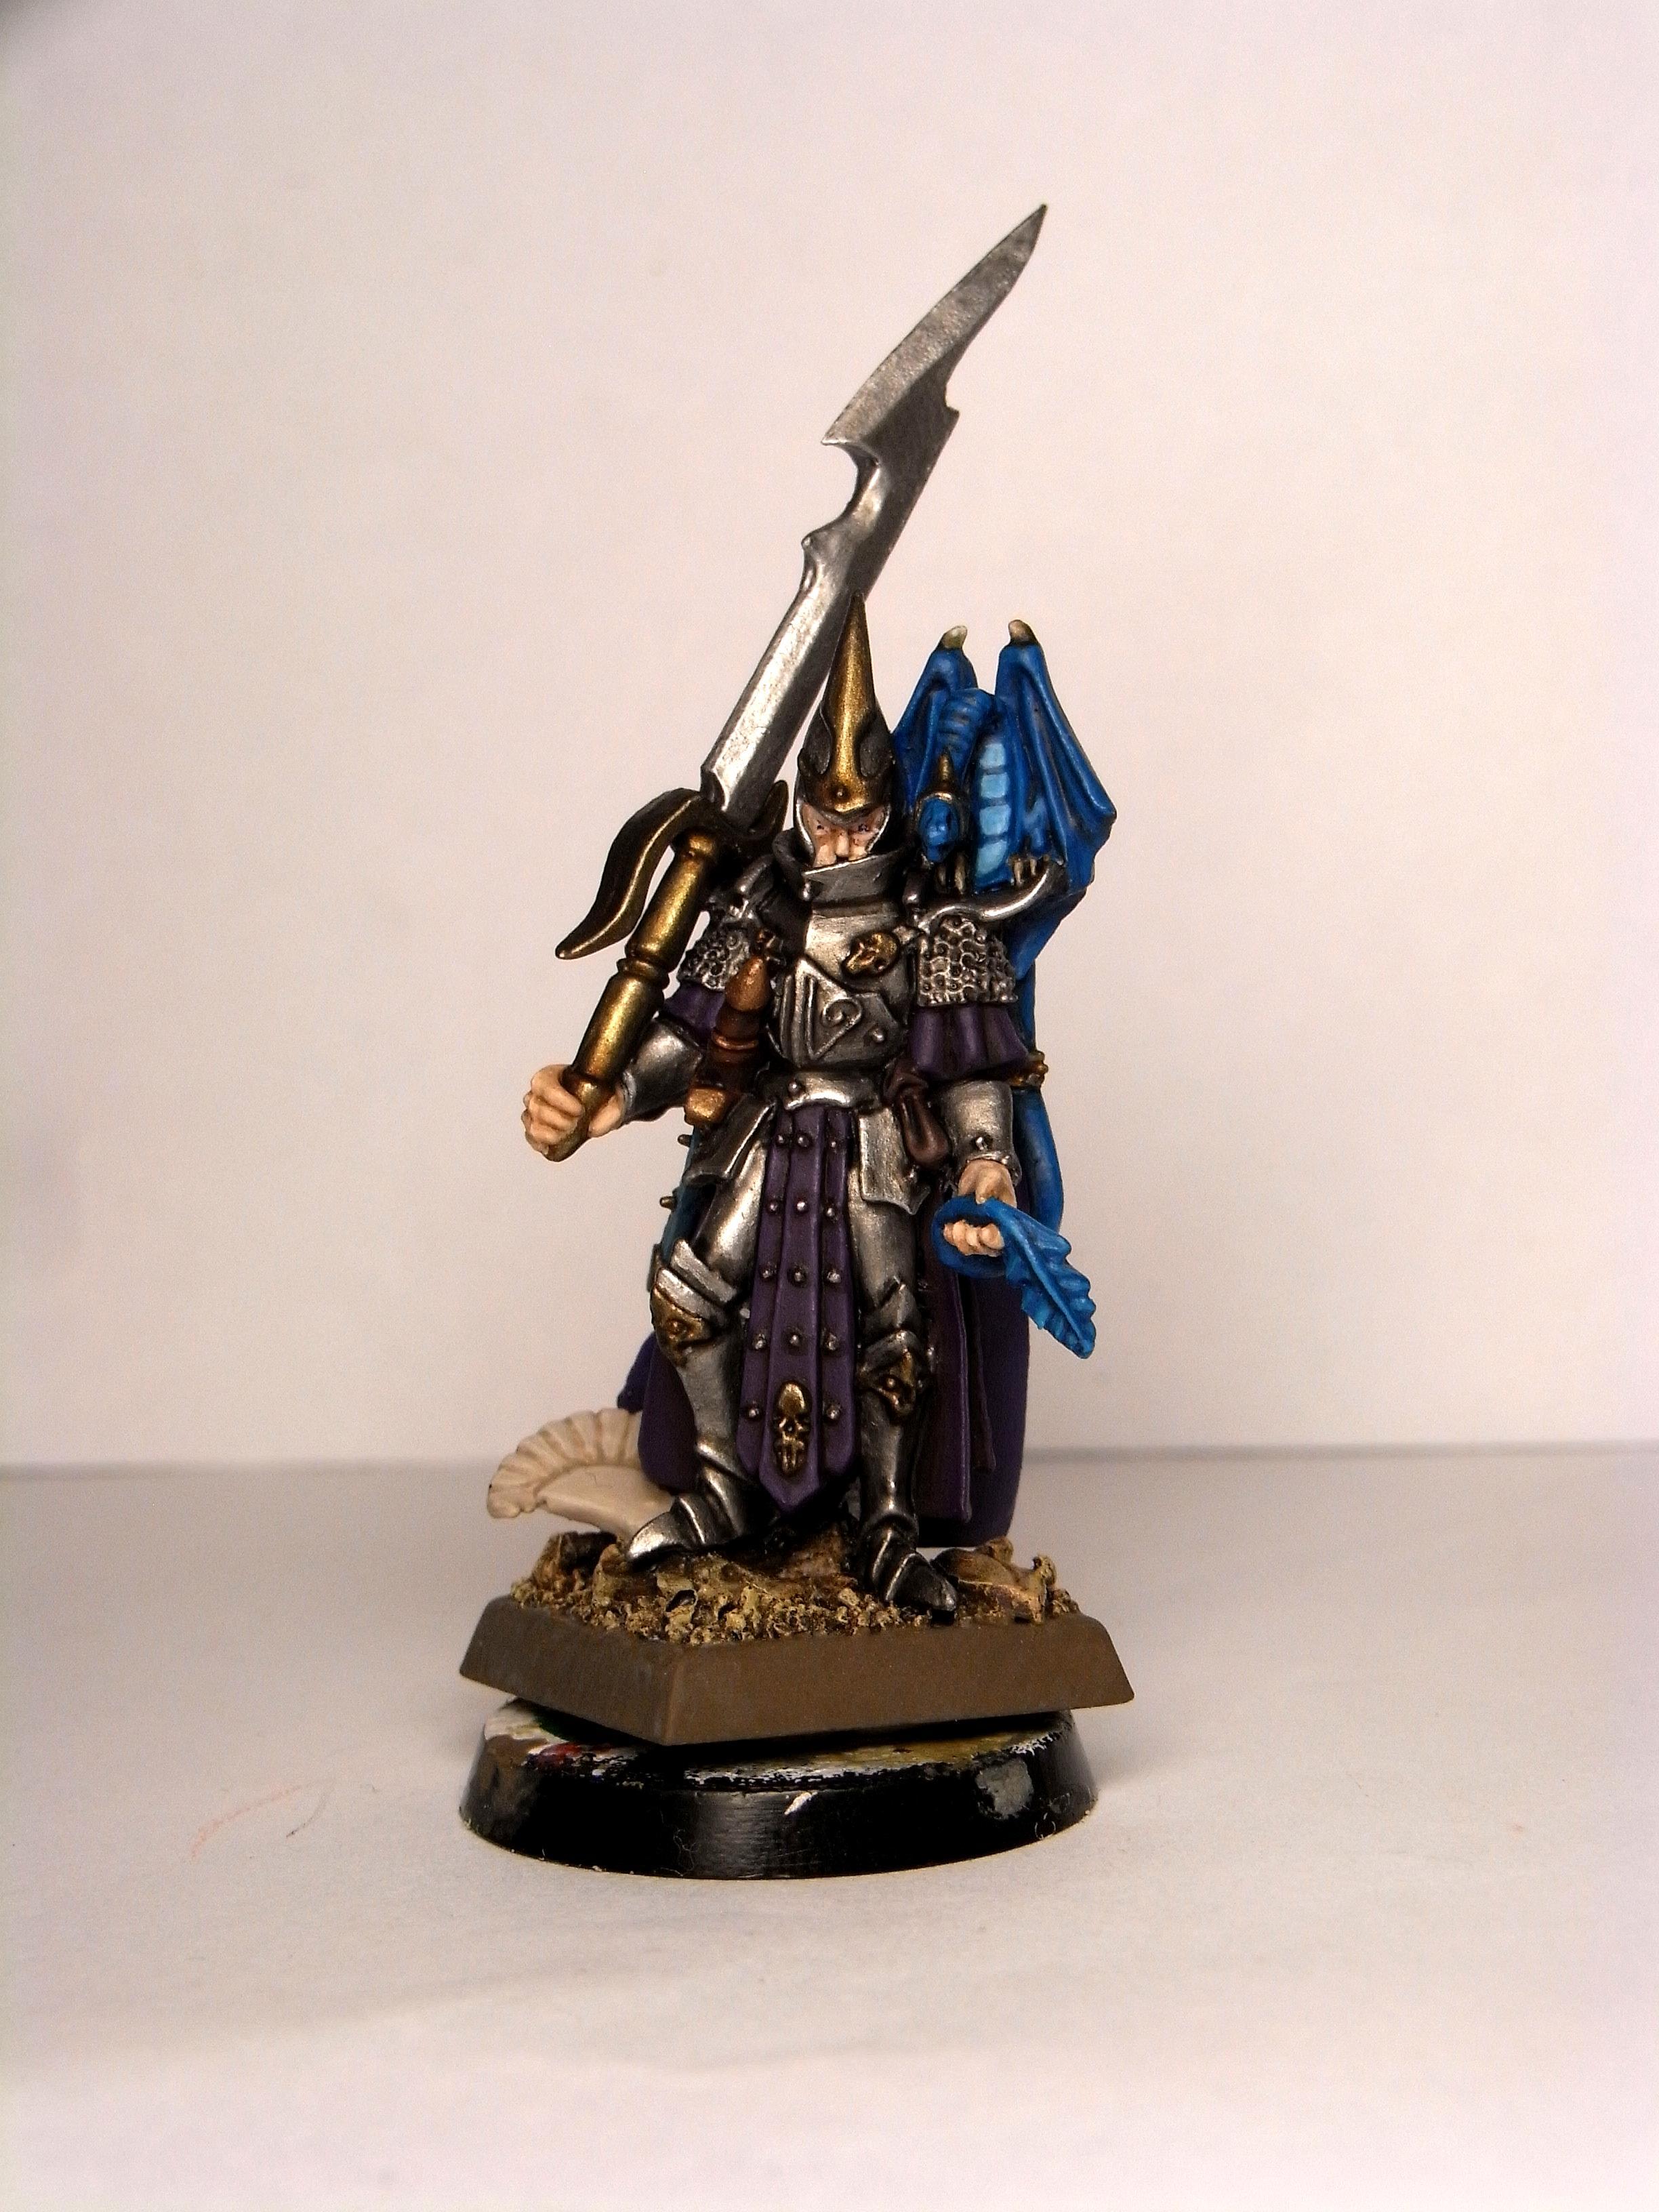 Corsairs, Dark Elves, Elves, Oldhammer, Warhammer Fantasy